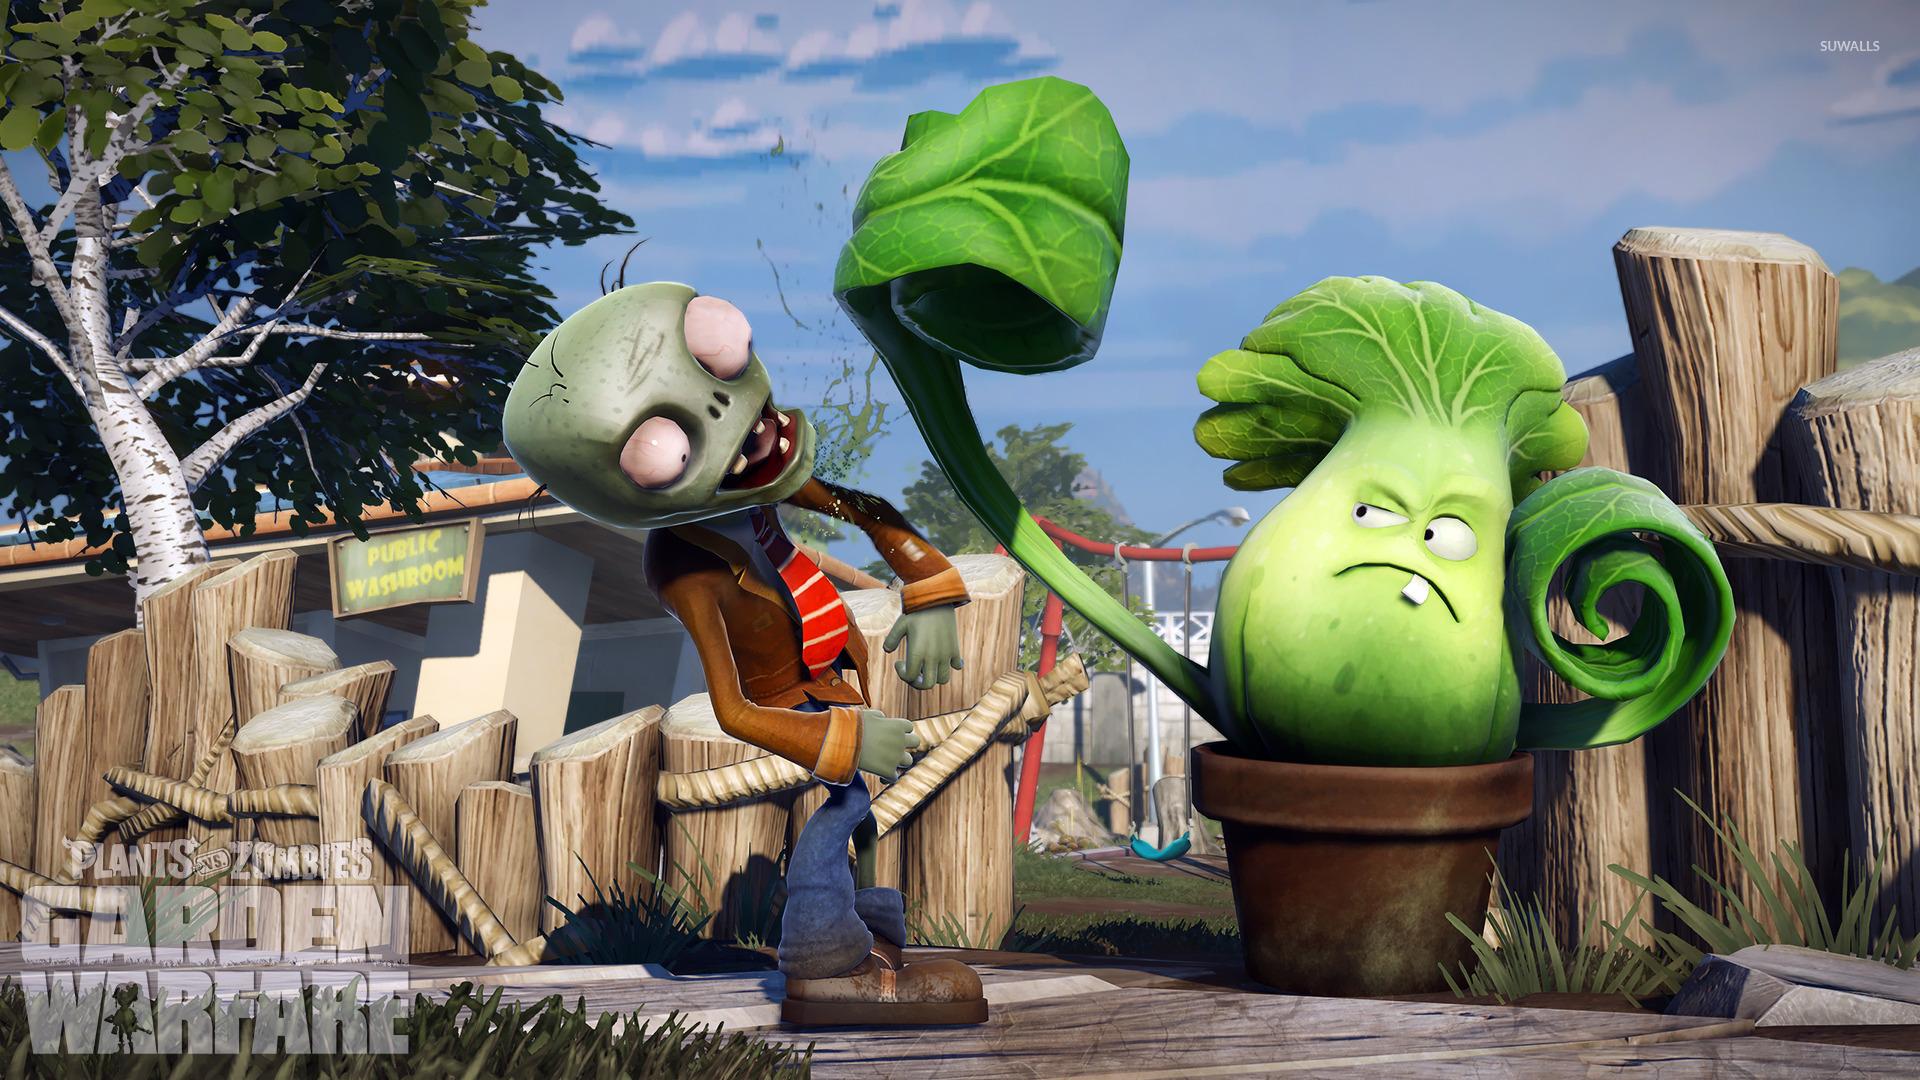 Plants Vs Zombies Garden Warfare 5 Wallpaper Game Wallpapers